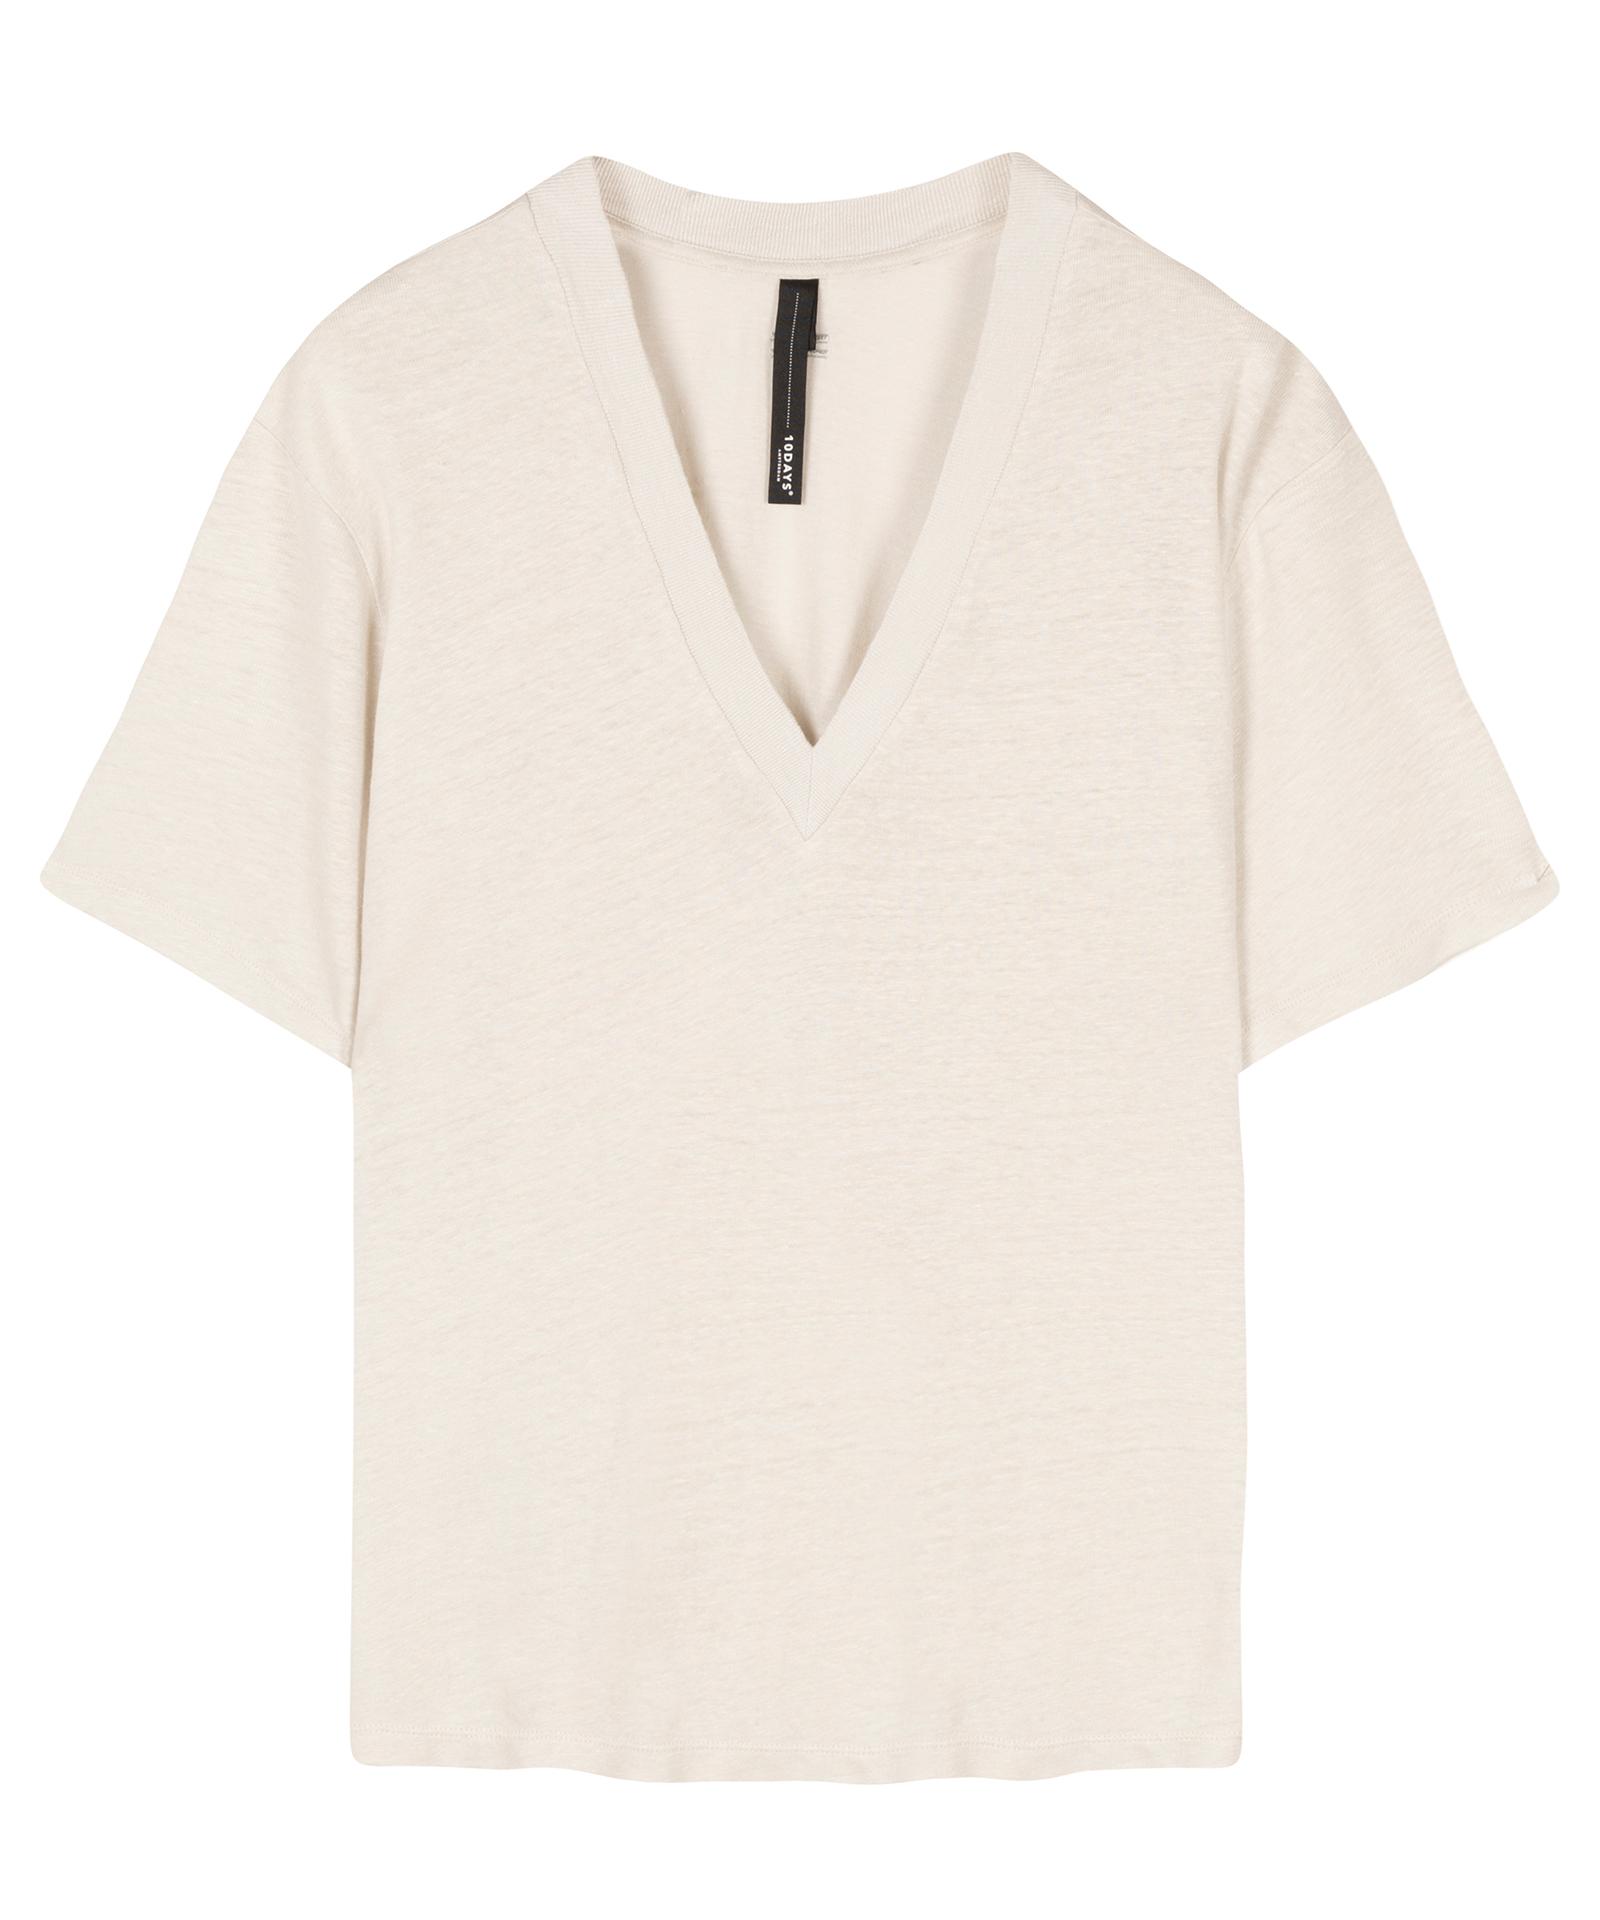 V-neck Tee Linen - Silver white